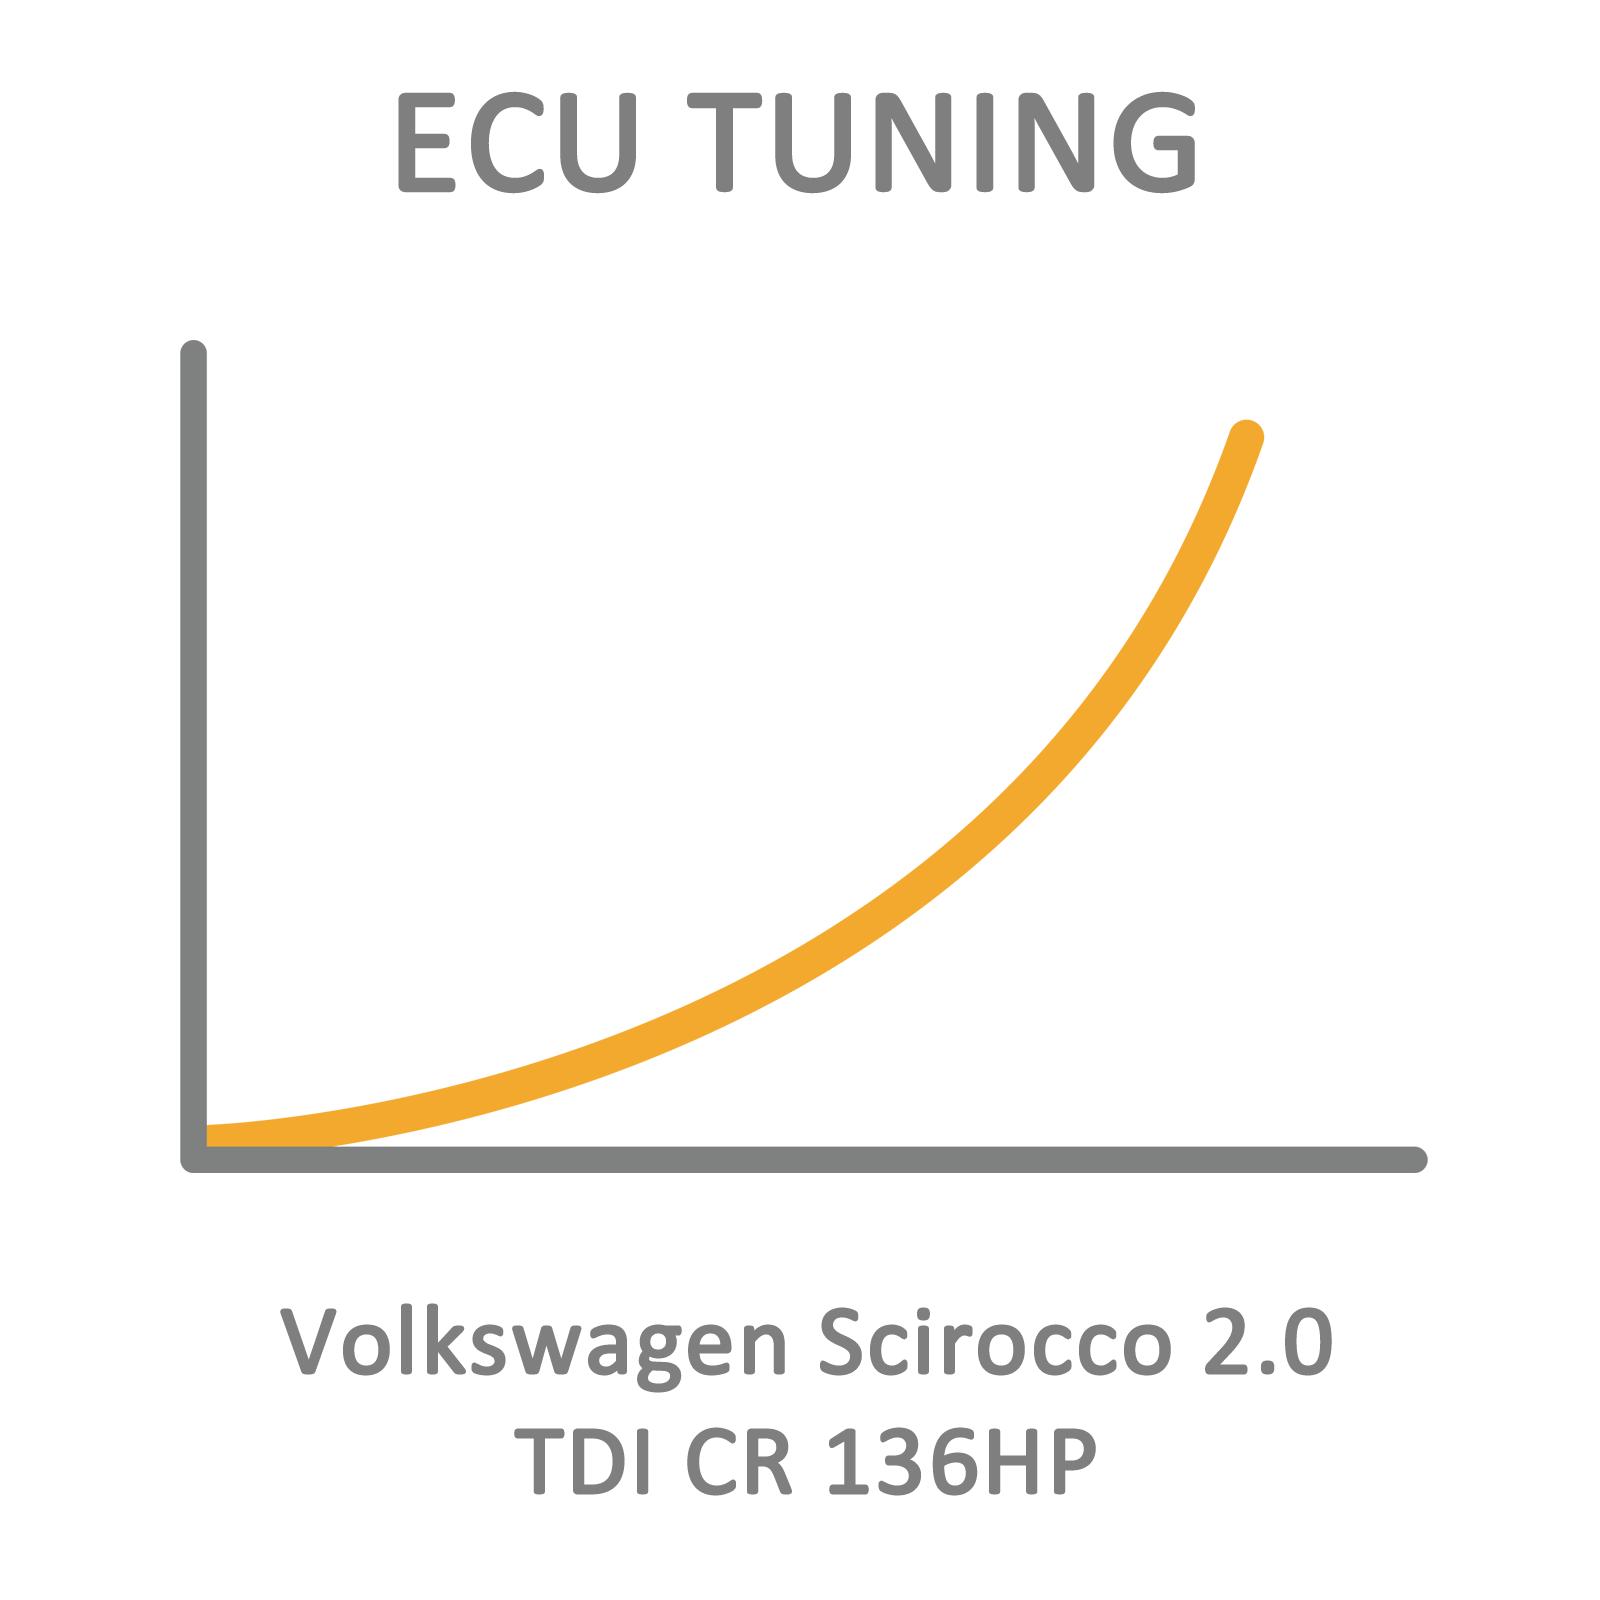 Volkswagen Scirocco 2.0 TDI CR 136HP ECU Tuning Remapping